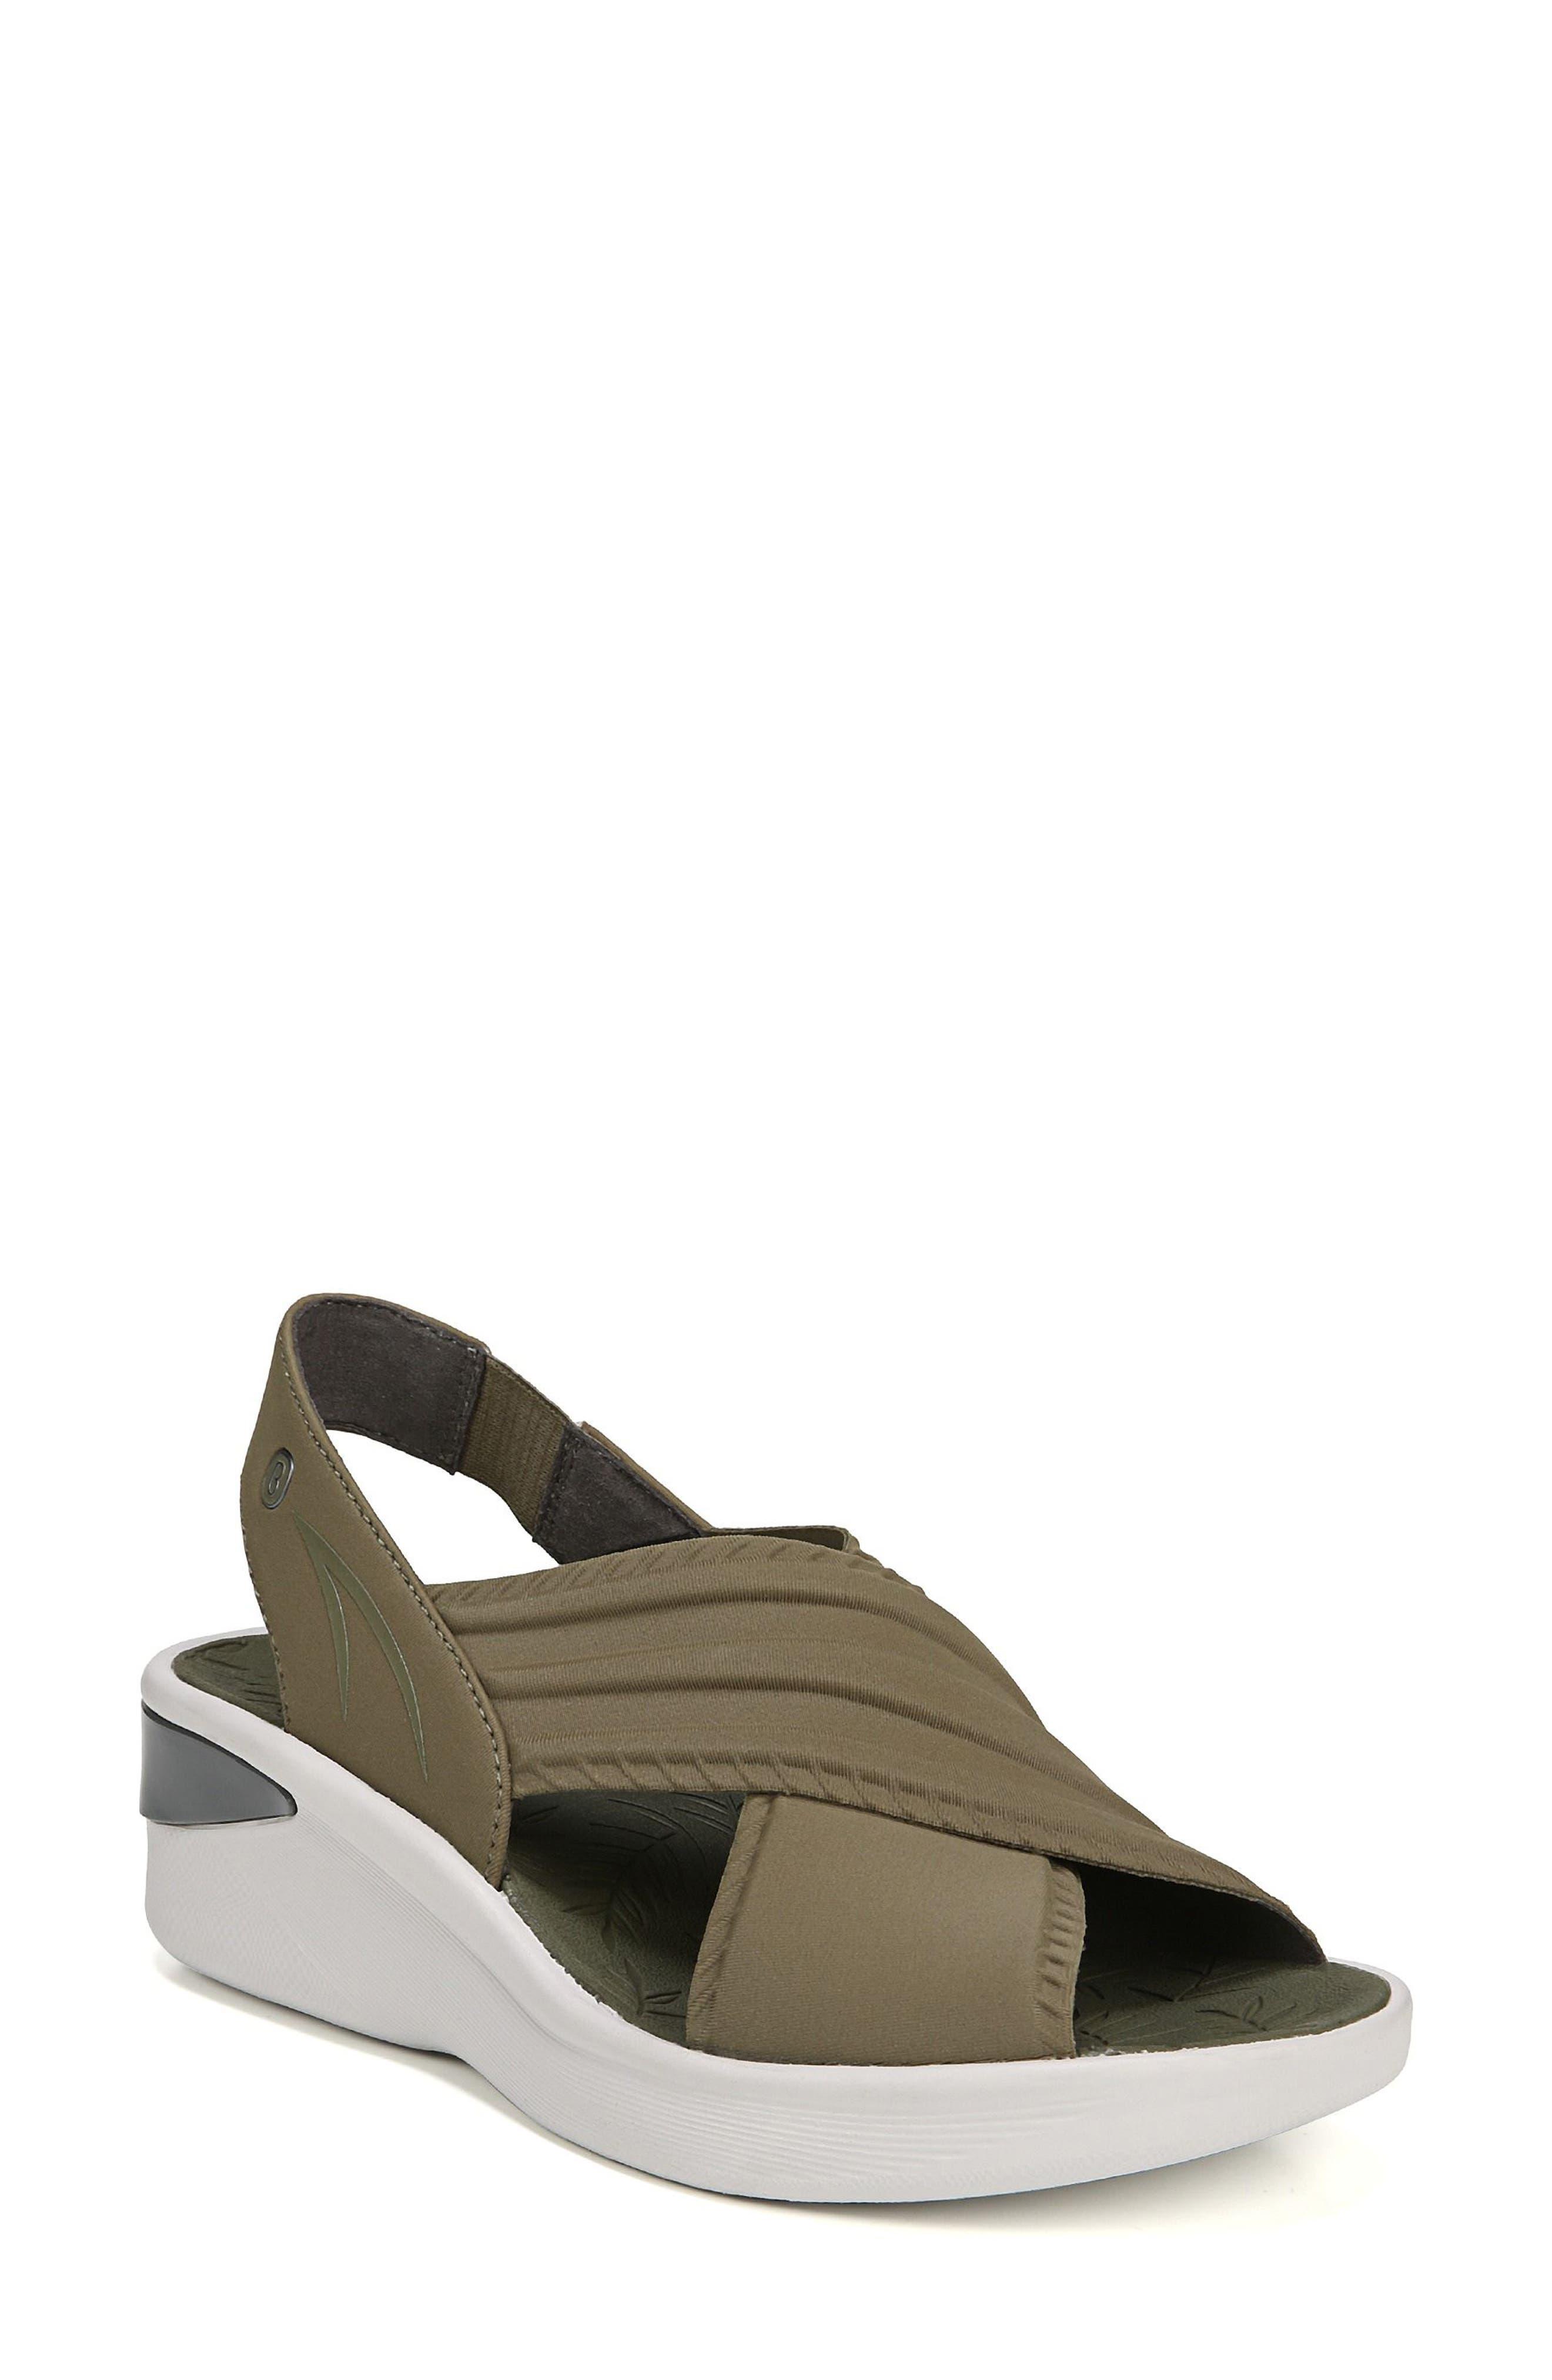 Sunset Wedge Sandal,                             Main thumbnail 1, color,                             Olive Fabric